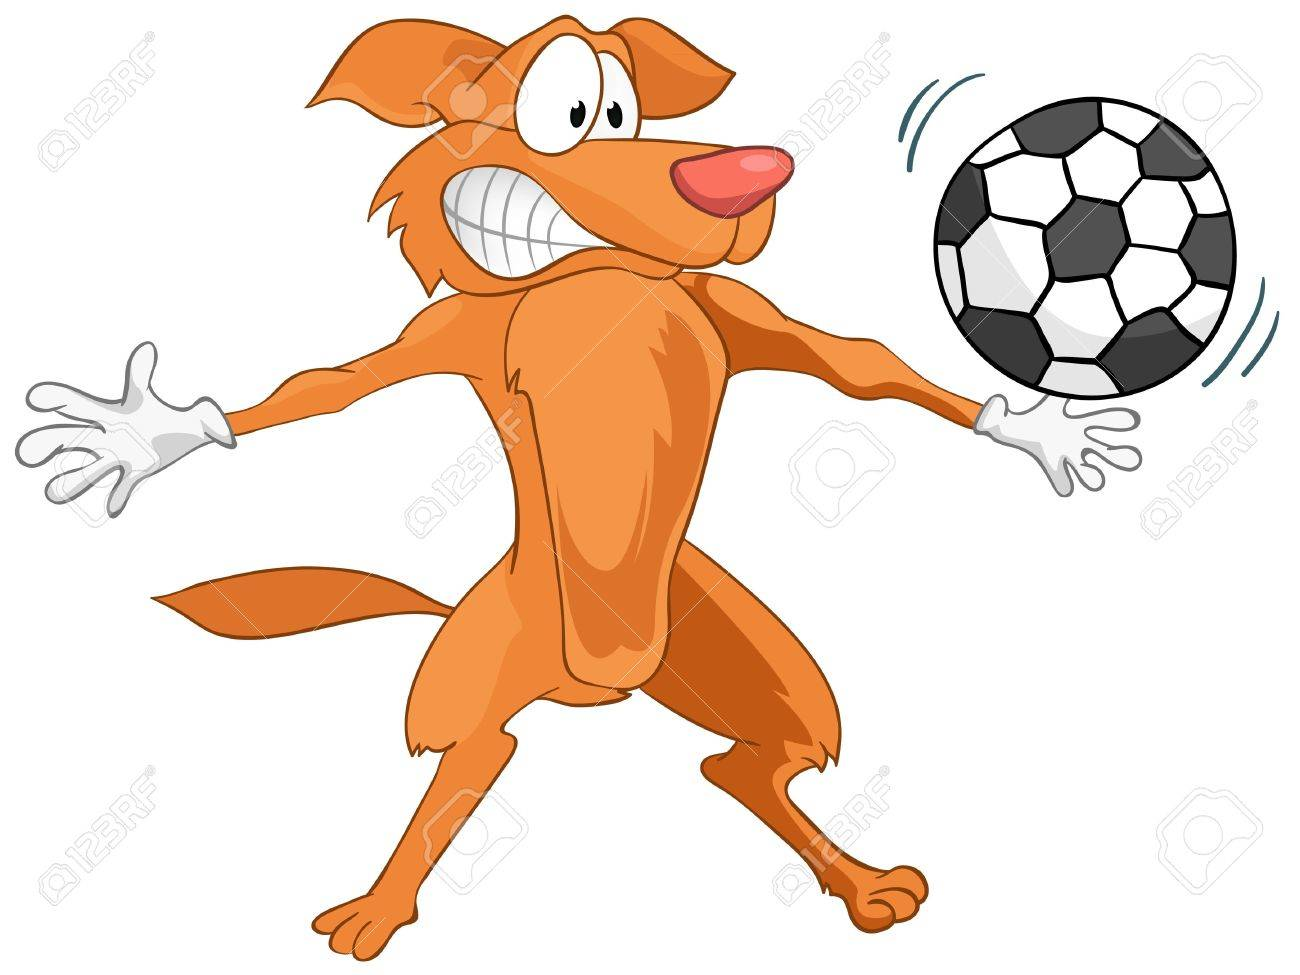 Cartoon Character Dog Stock Vector - 11929413